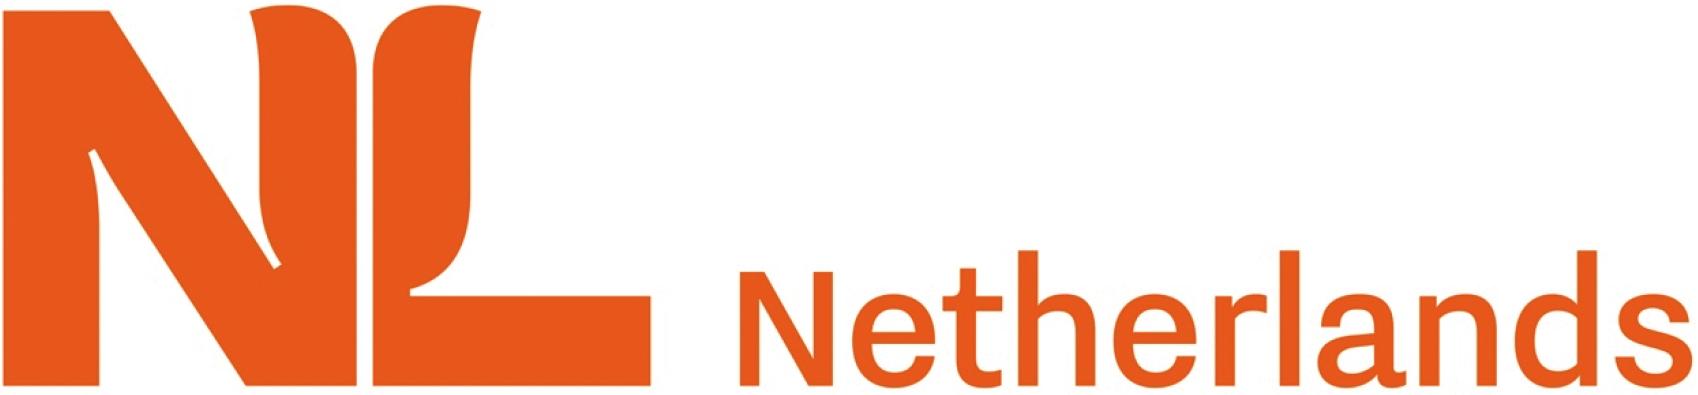 https://zoek.officielebekendmakingen.nl/stcrt-2019-60586-001.png